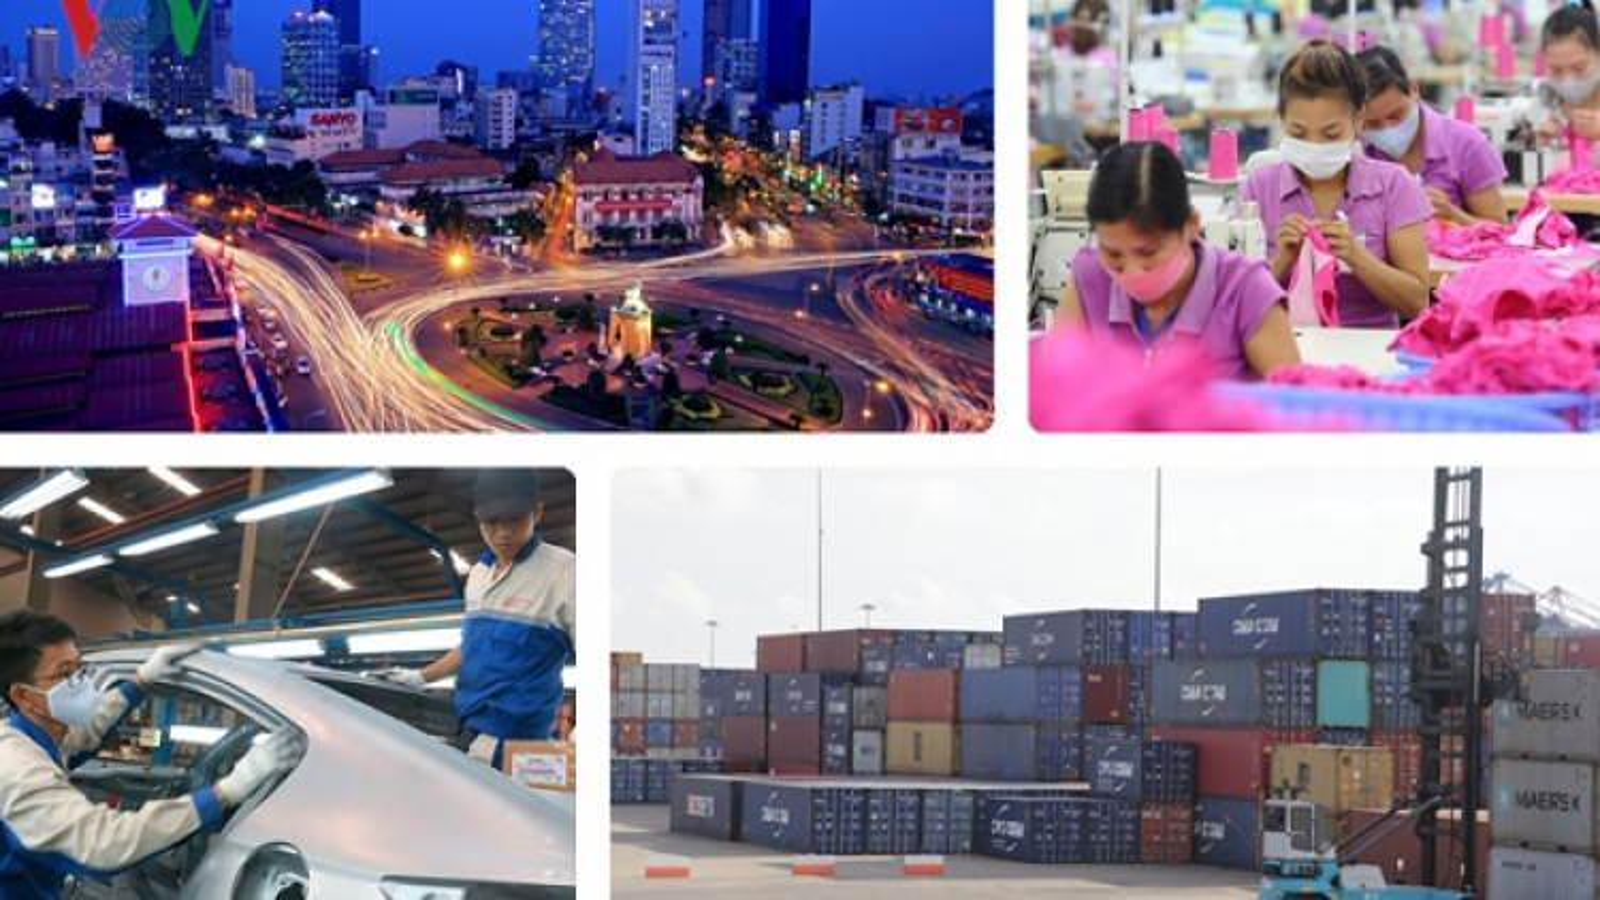 EVFTA, EVIPA offer equal benefits to signatories